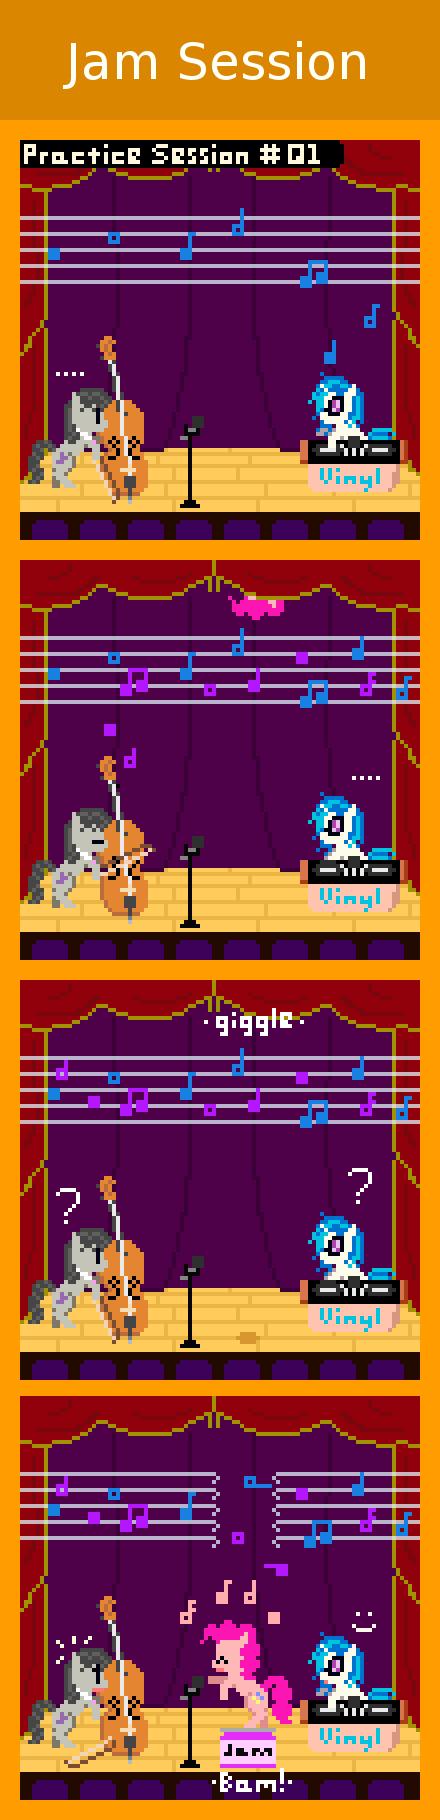 "Jam Session. via zztfox.deviantart.com/art/Jam-Session... Octavia: ""Vinyl, you are suppose to be taking these practice sessions VERY seriously!!"" Viny My Little Pony retro pony pixel octavia Vinyl scratch dj pon3 Pinkie Pie comic jam"